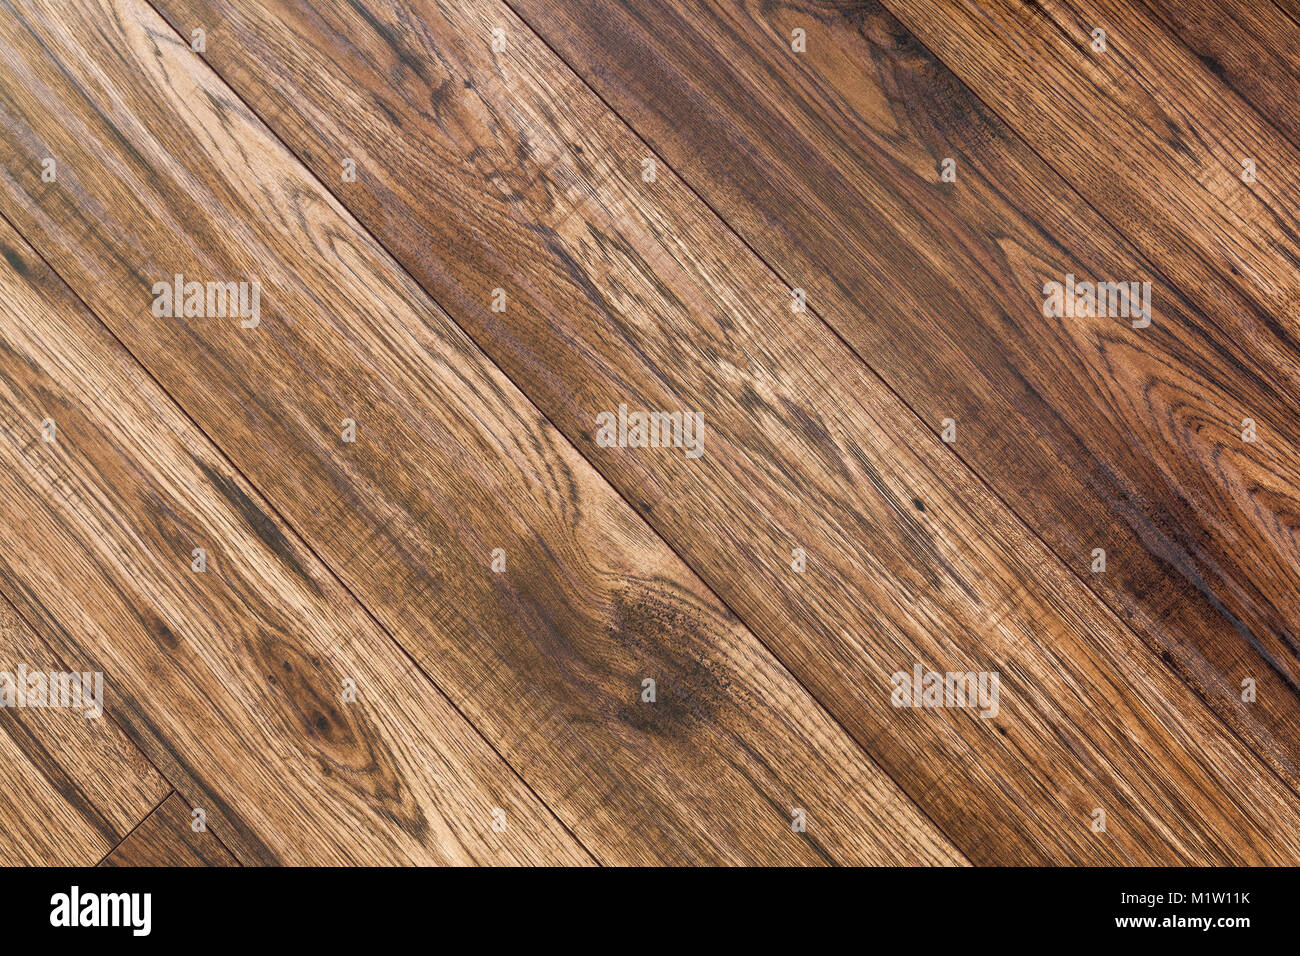 Holz  Hintergrund, Textur, Muster Stockbild